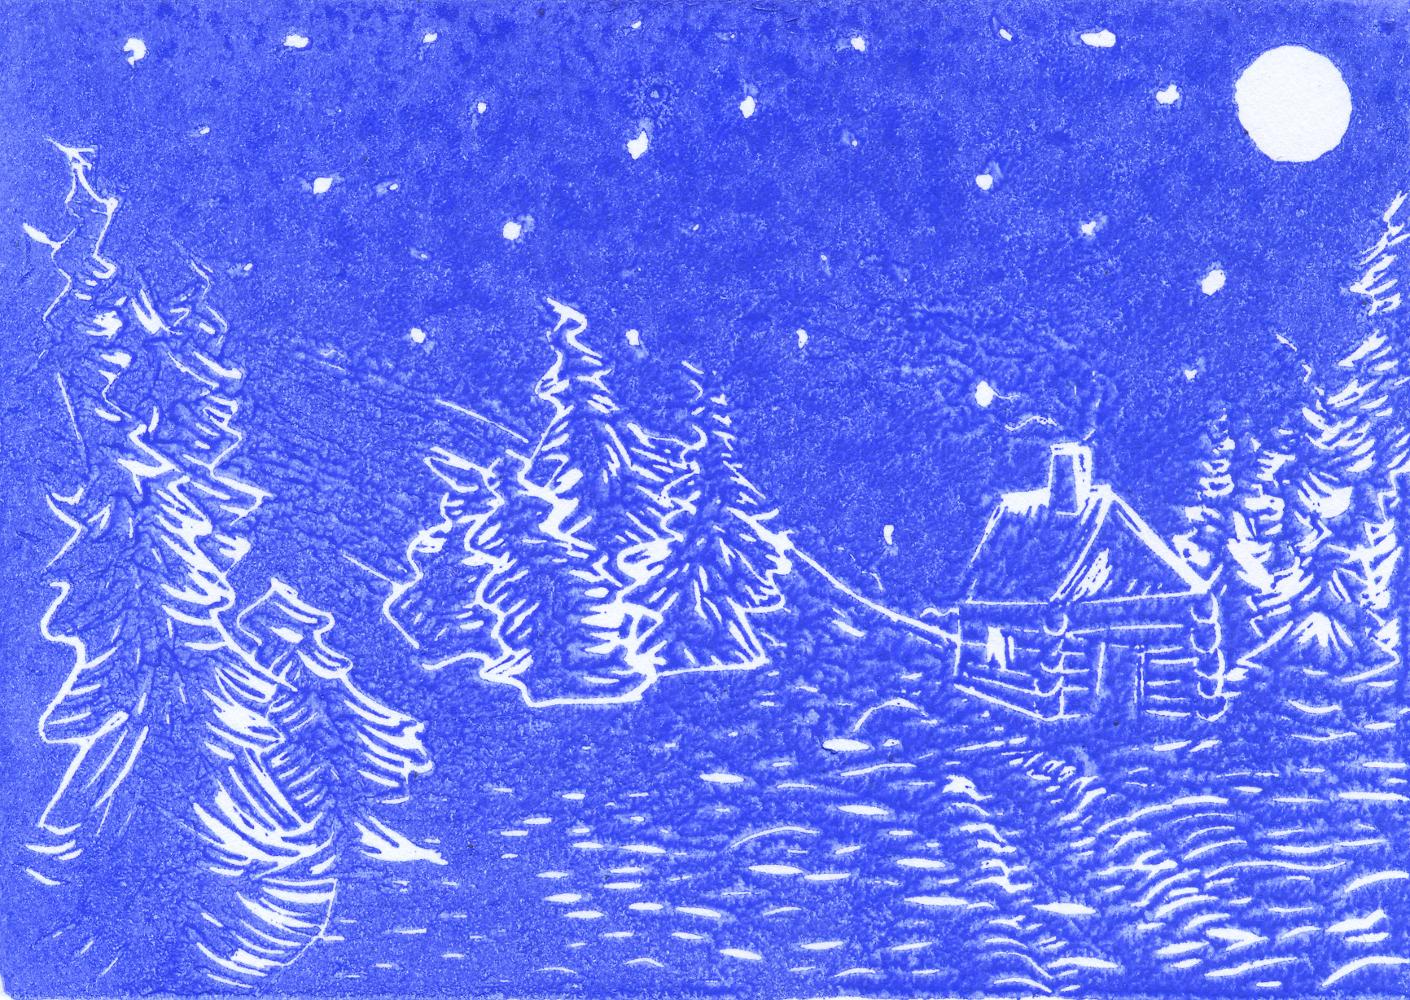 """Winterberge II"", 2018, Linolschnitt auf Pappe, 15 x 11 cm"